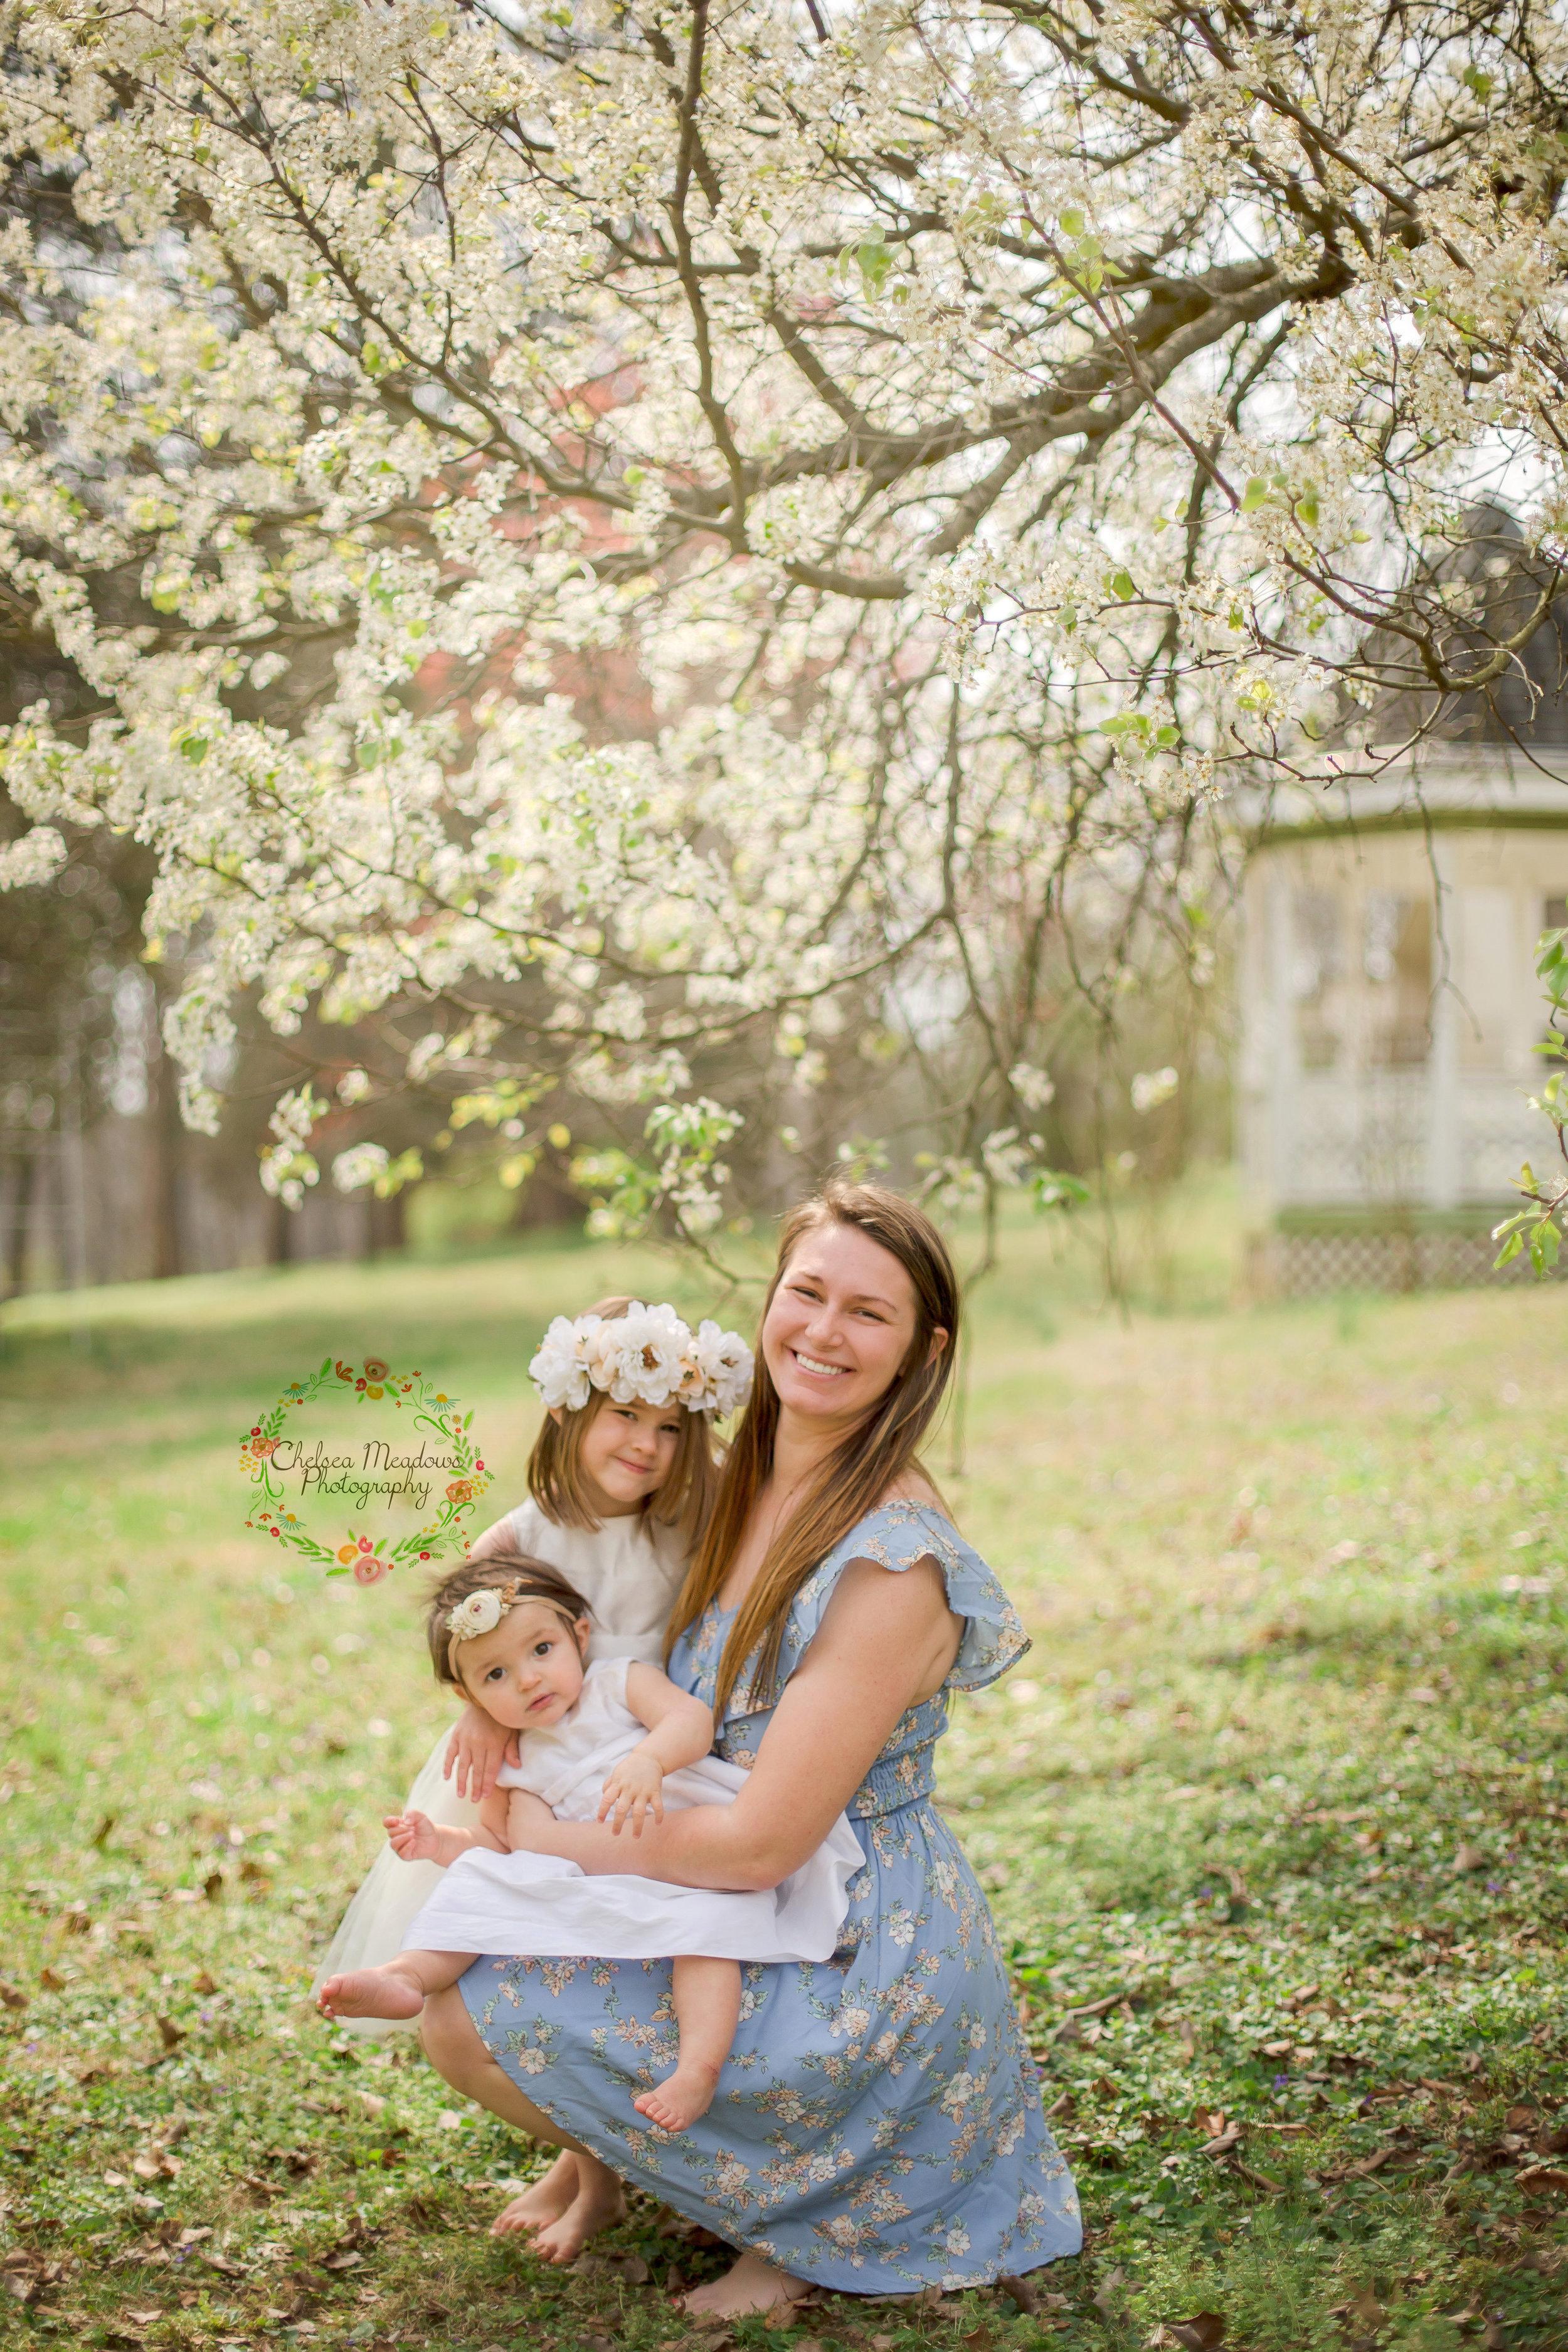 Ellis Family Spring Minis - Nashville Family Photographer - Chelsea Meadows Photography (10)_edited-1.jpg